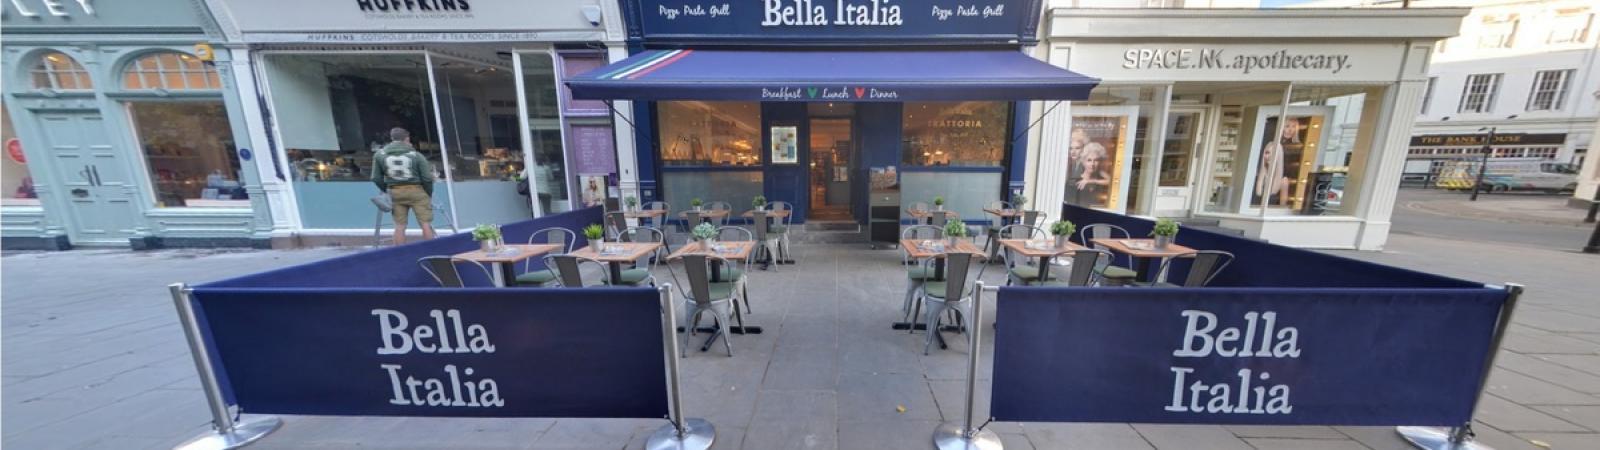 BELLA ITALIA on Cheltenham Night Out | Promoting Cheltenham's nightlife for a great night out in Cheltenham.